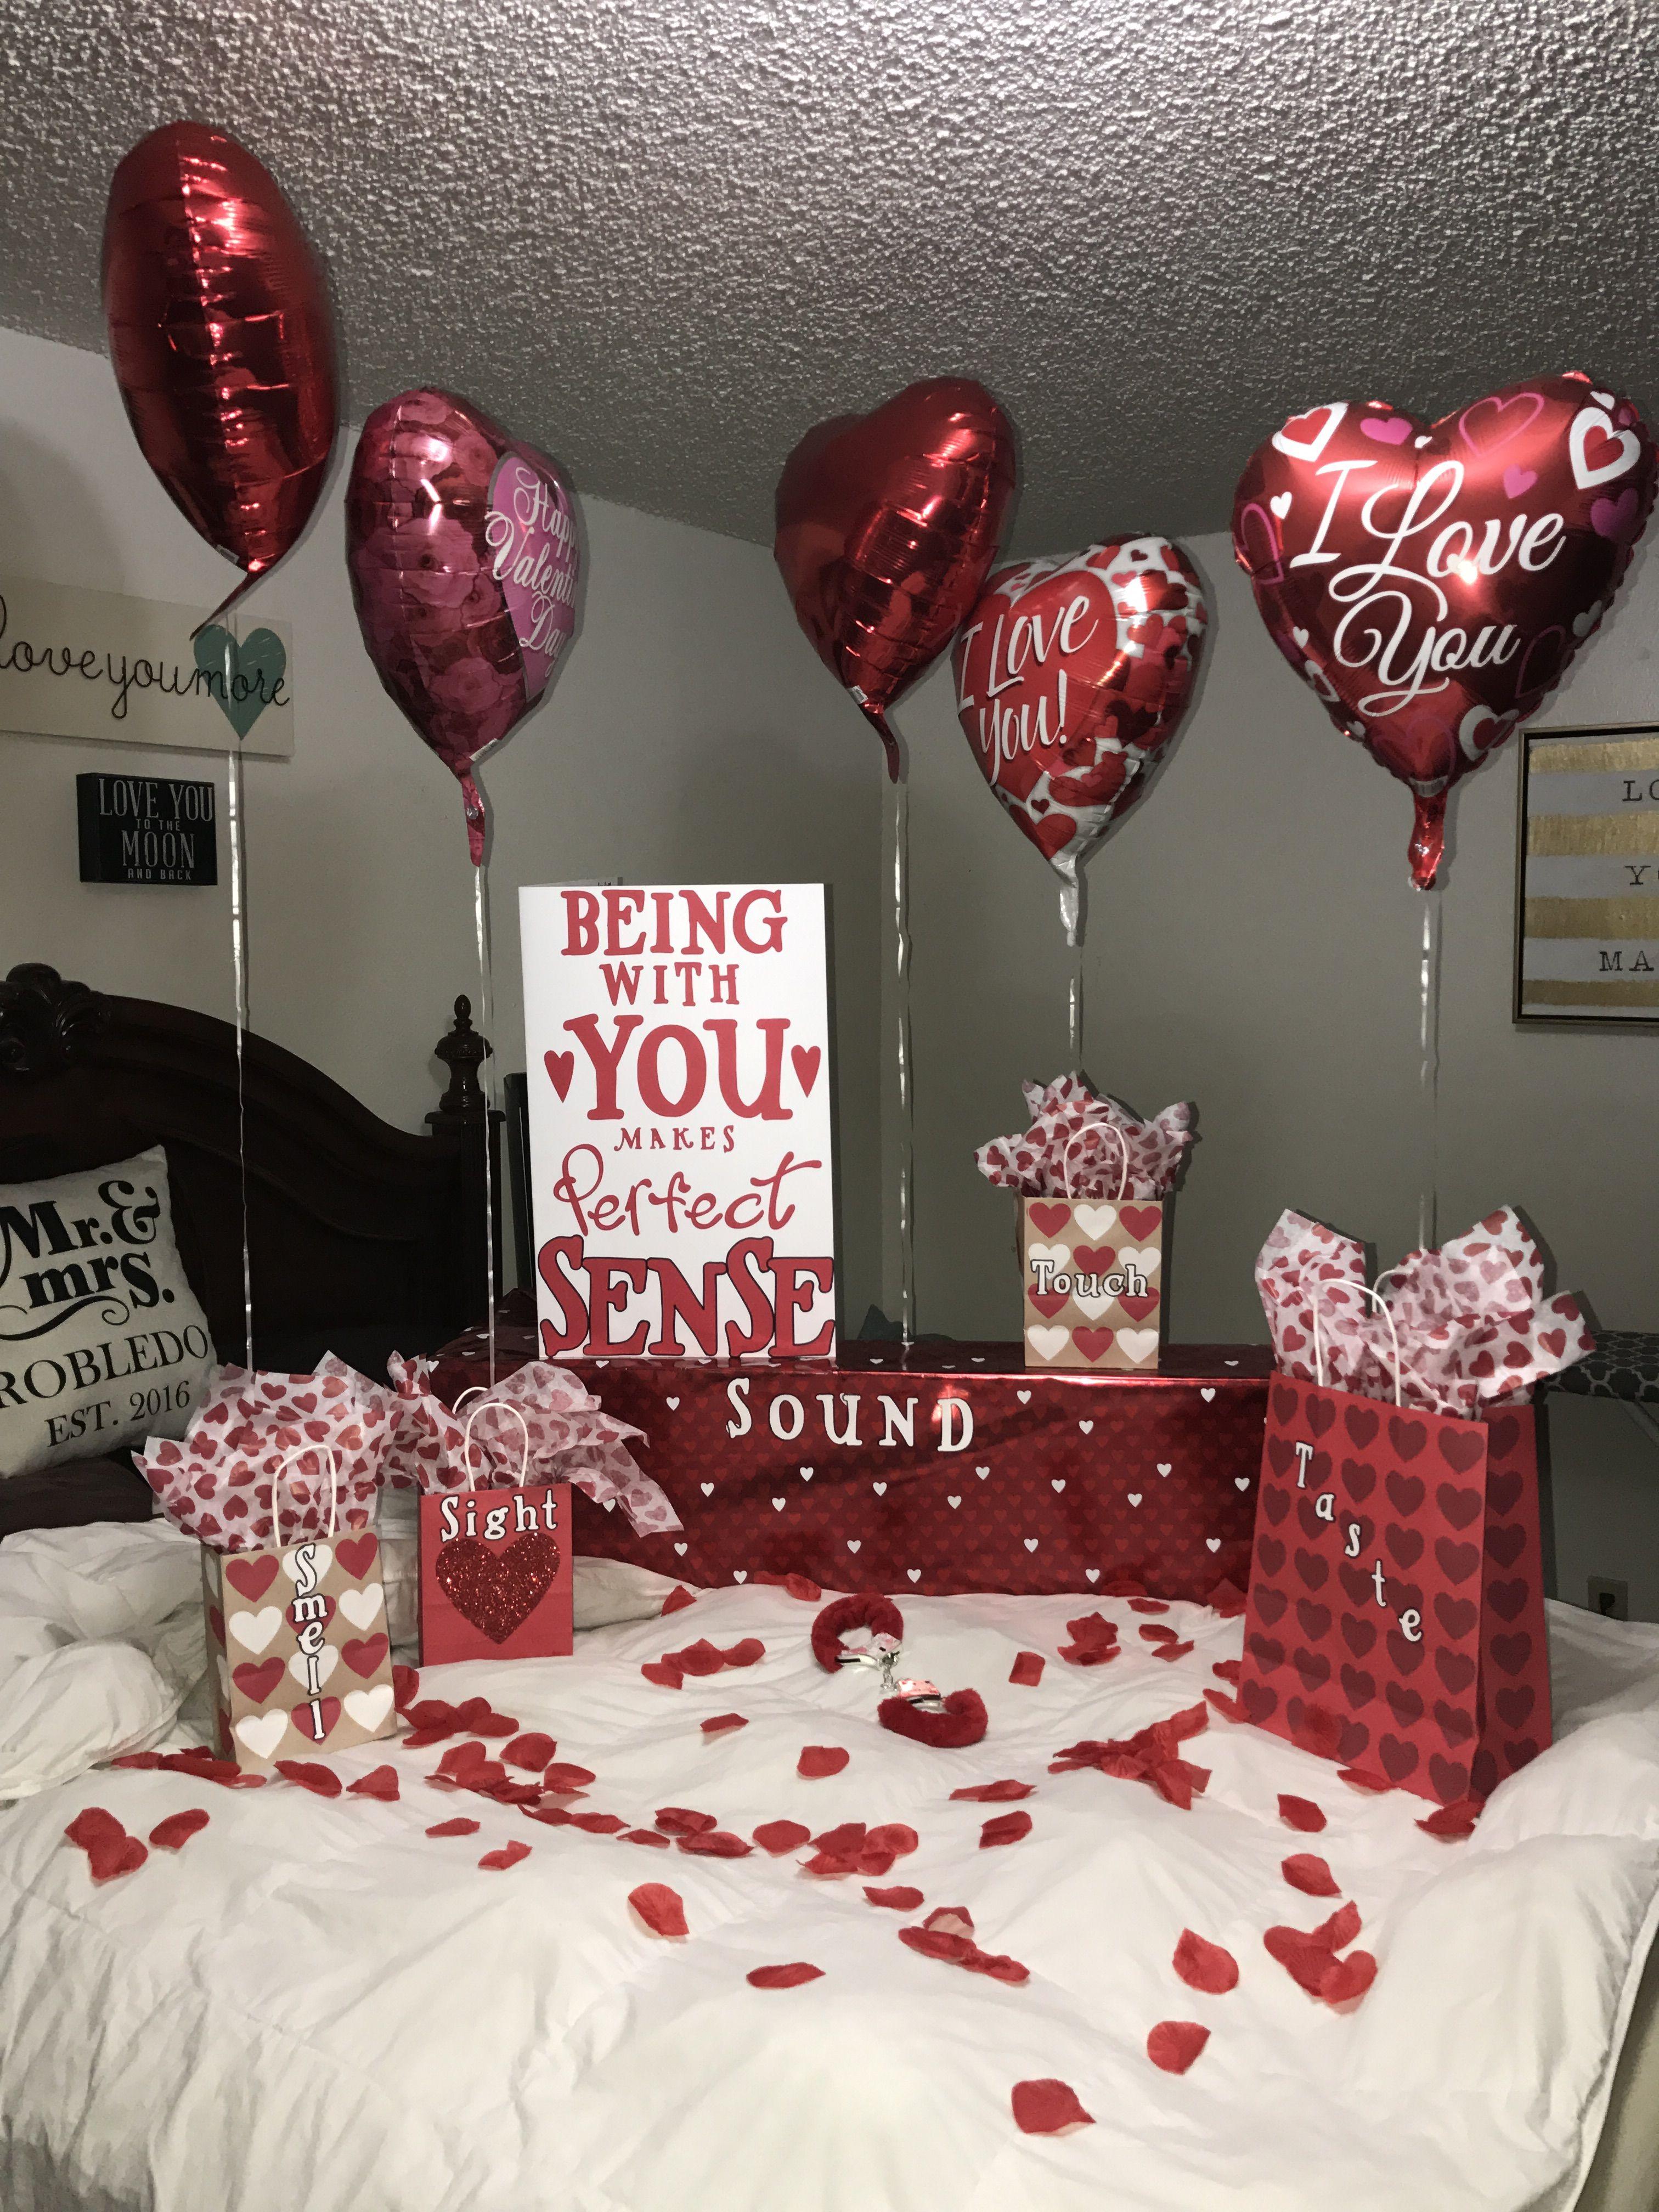 Valentine S Day Surprise For Him 5 Senses Anniversarygifts Valentines Gifts For Boyfriend Surprise Gifts For Him Diy Valentines Gifts